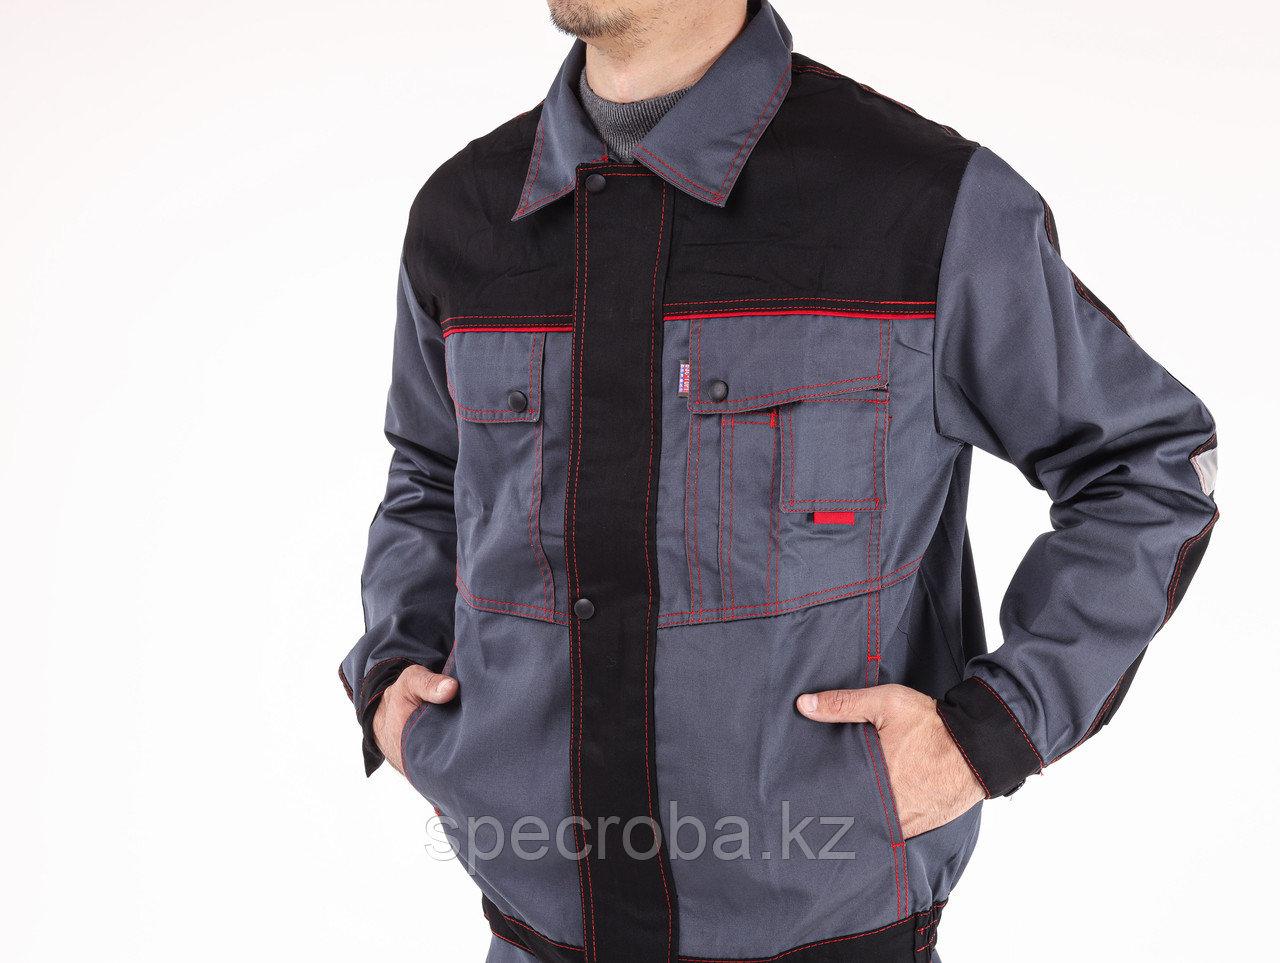 Костюм летний Арт-19, (куртка - полукомбинезон)